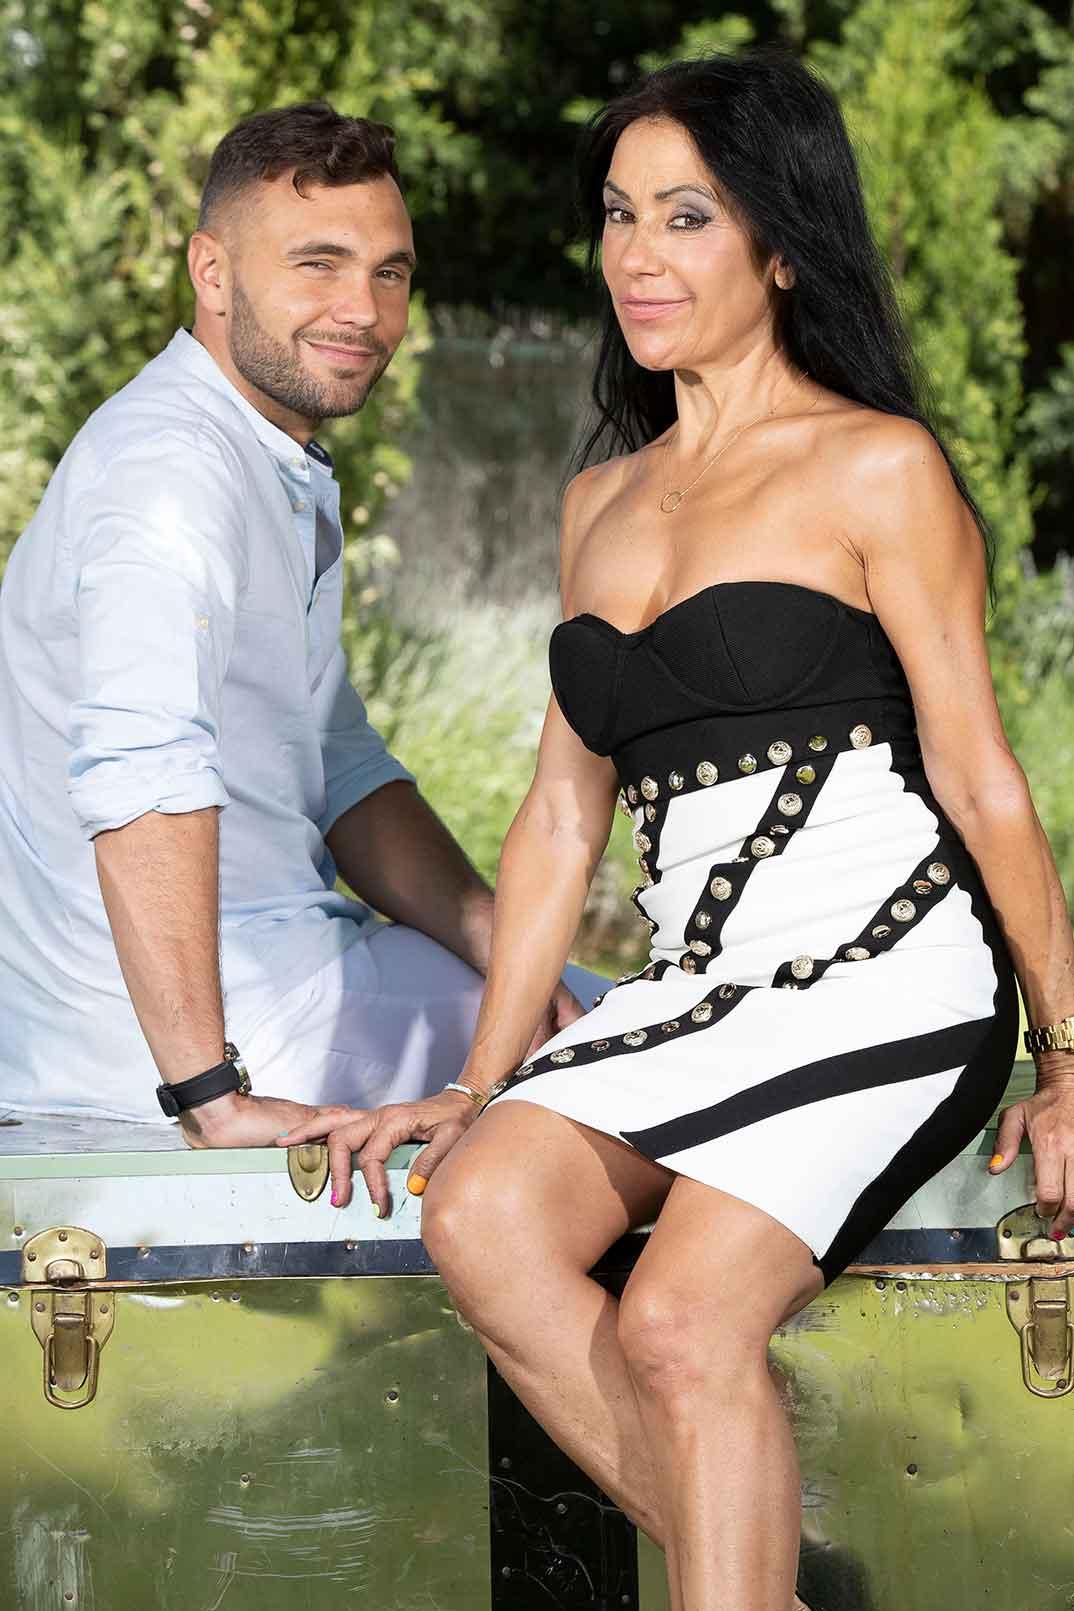 Maite y Cristian - La casa fuerte © Mediaset